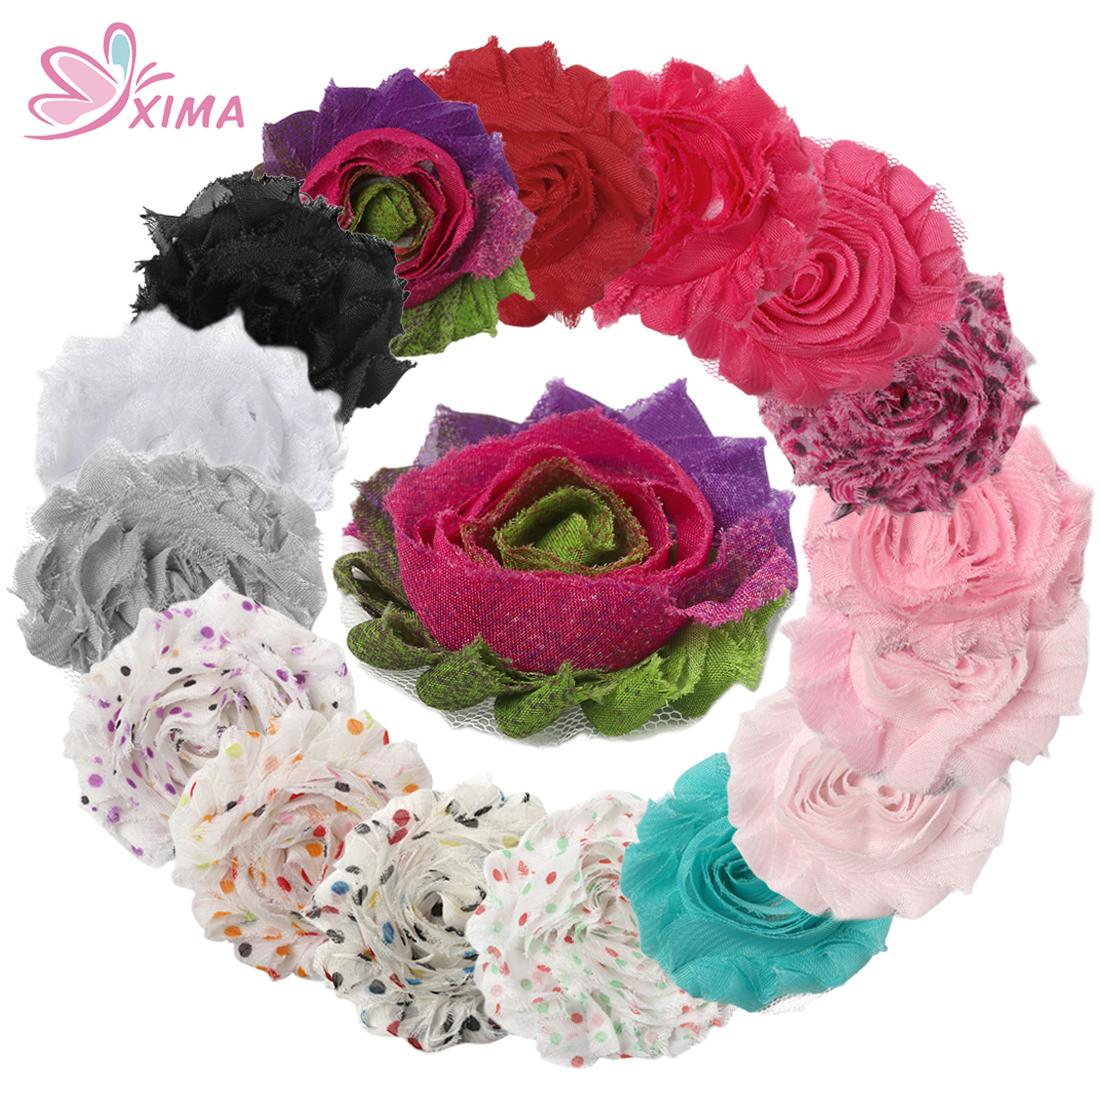 Xima Diy Headmade 25 Frayed Chiffon Shabby Flower Rose Flower For